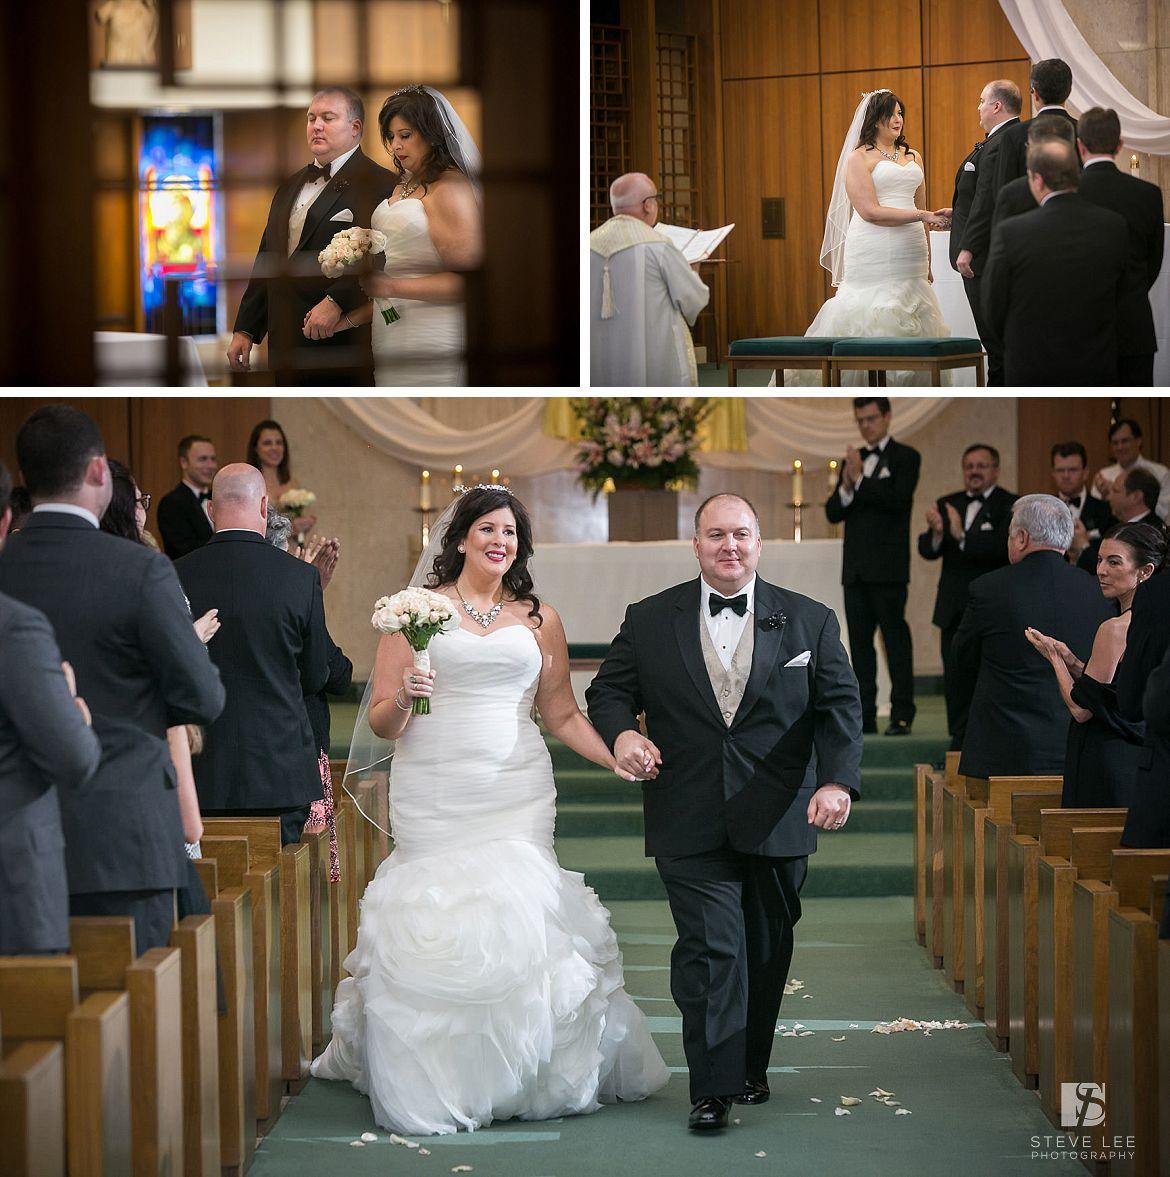 Steve Lee Weddings » Sara And Michael Wray Wedding At St